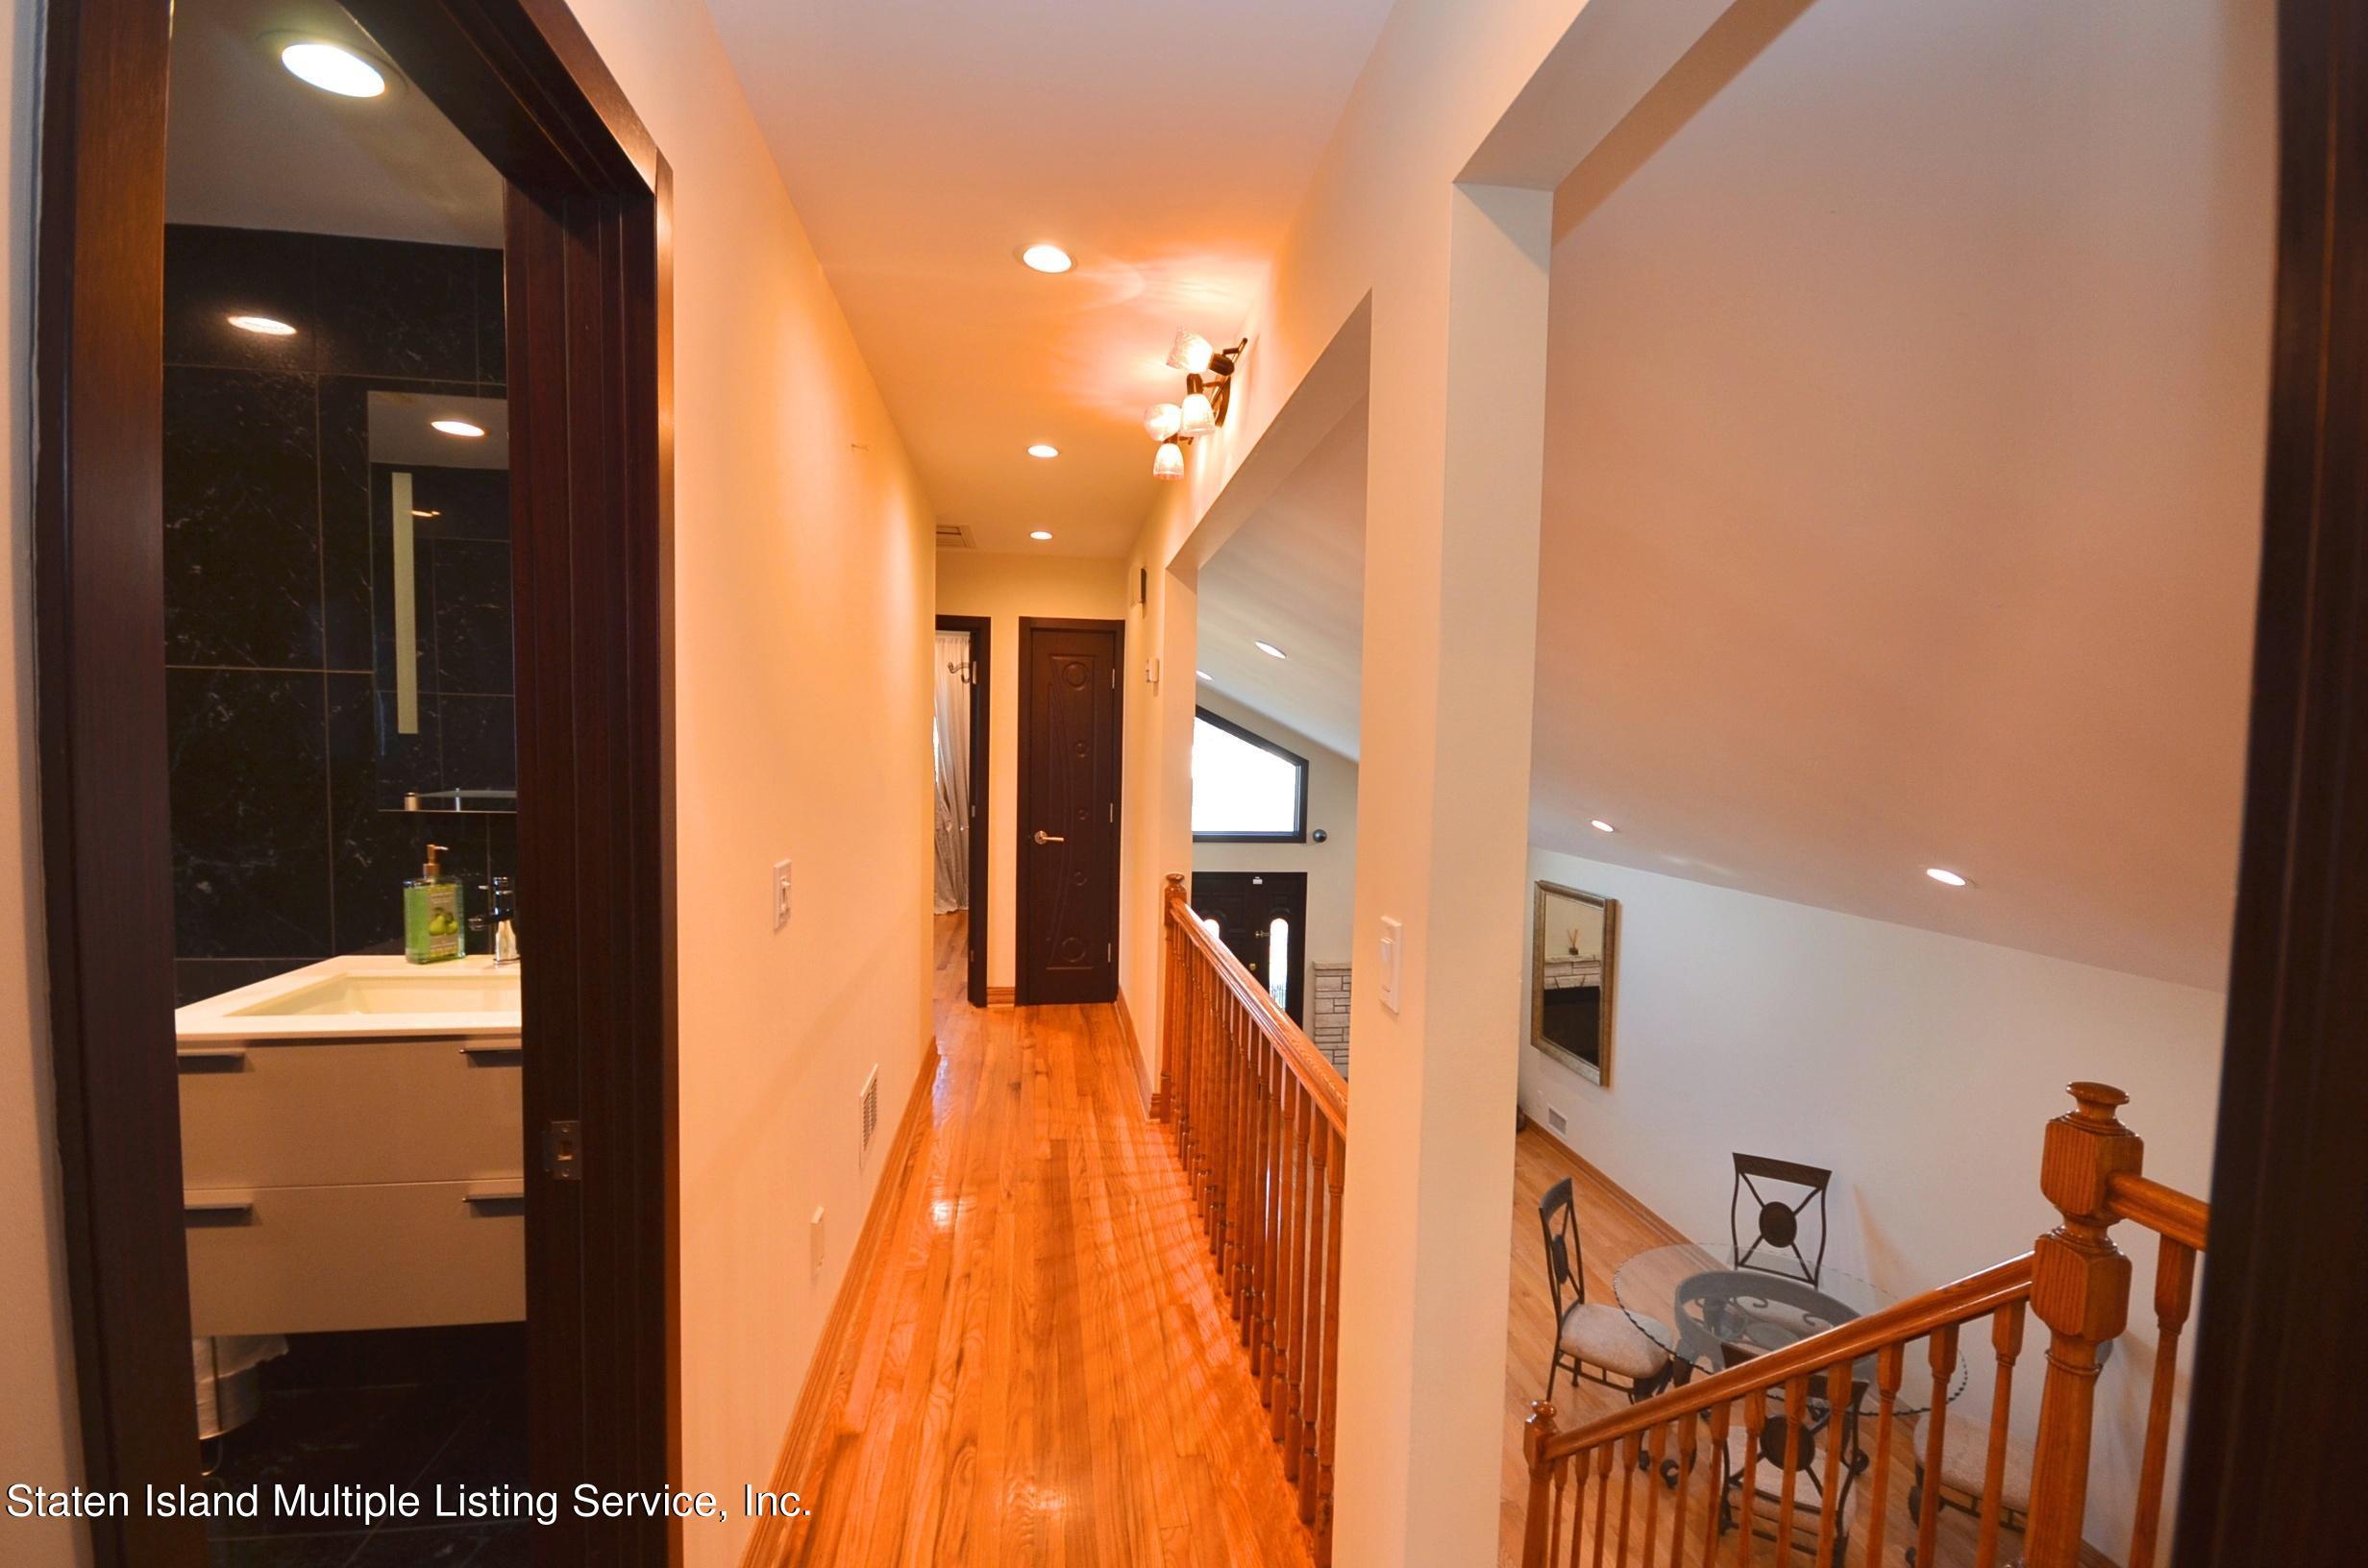 Single Family - Detached 48 Ocean Terrace  Staten Island, NY 10314, MLS-1142240-14